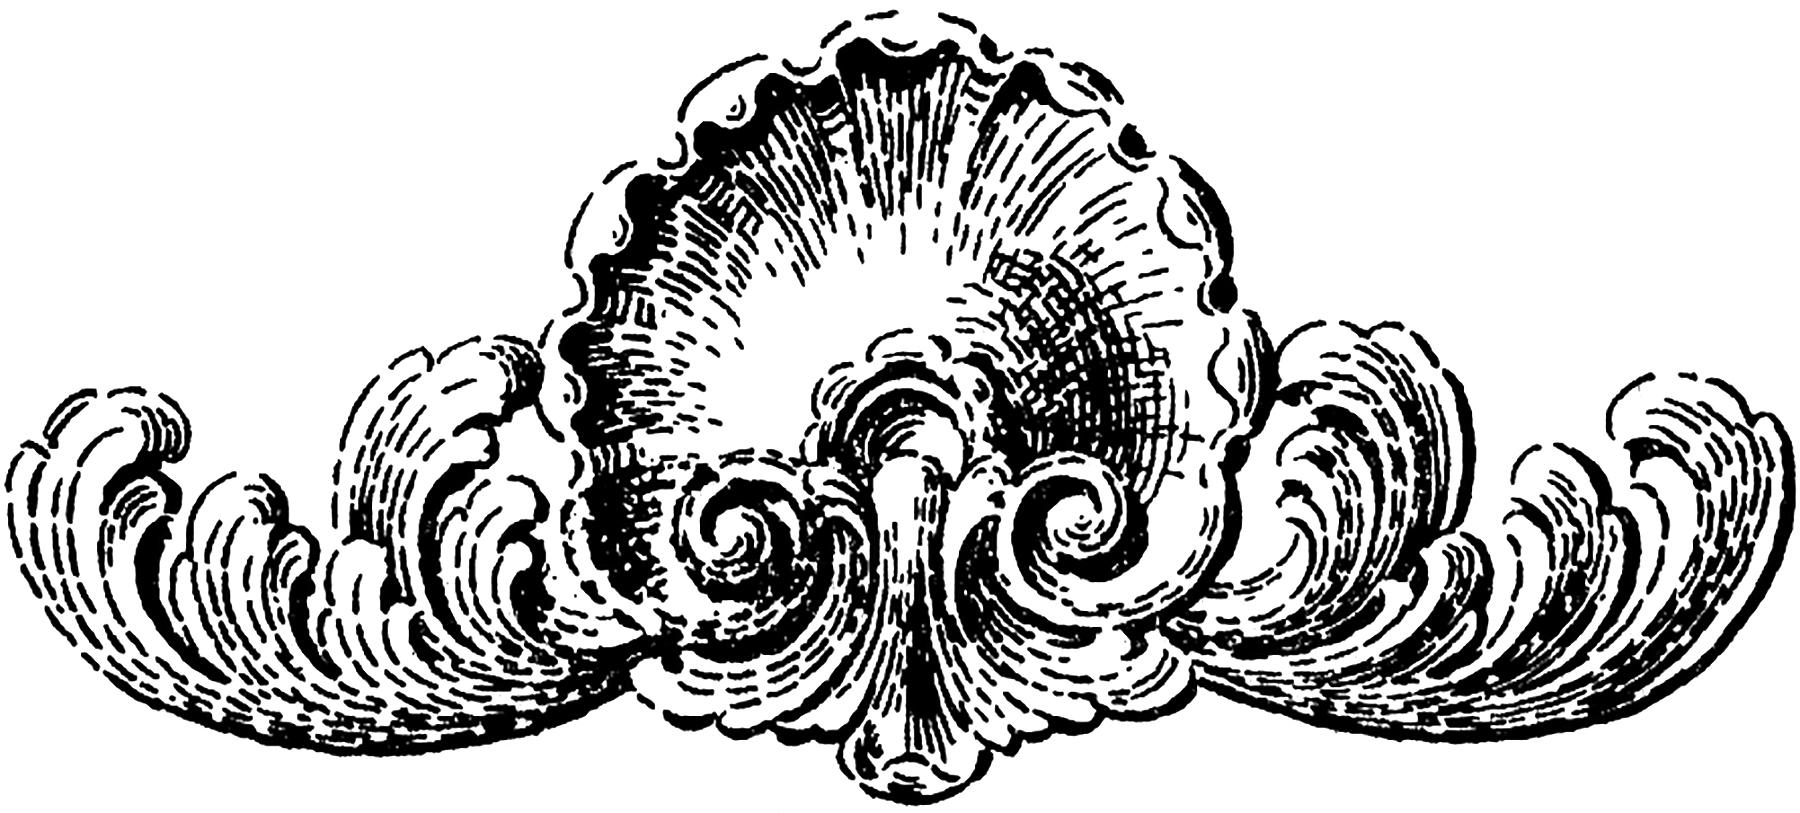 Seashell Embellishment Image